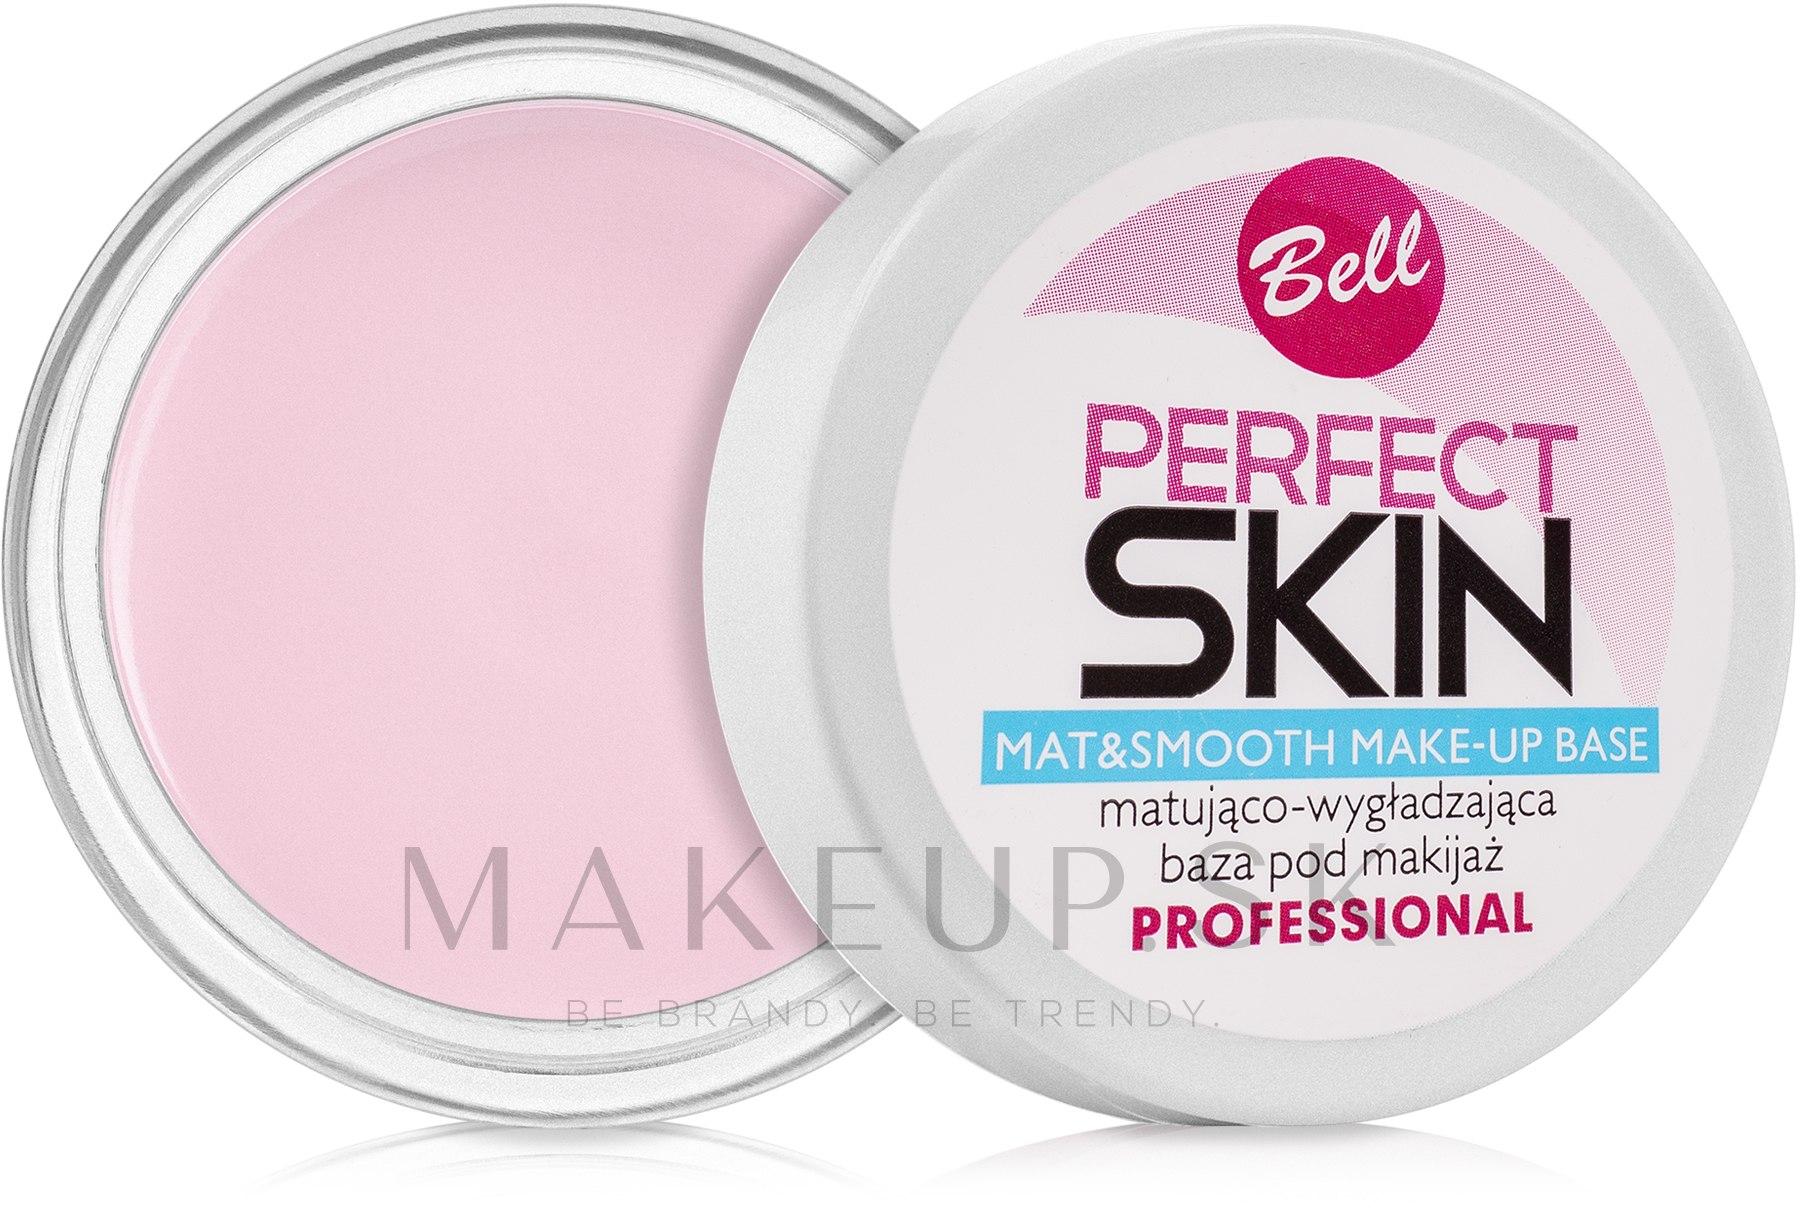 Základ pod make-up pre tvár - Bell Perfect Skin Base — Obrázky N10